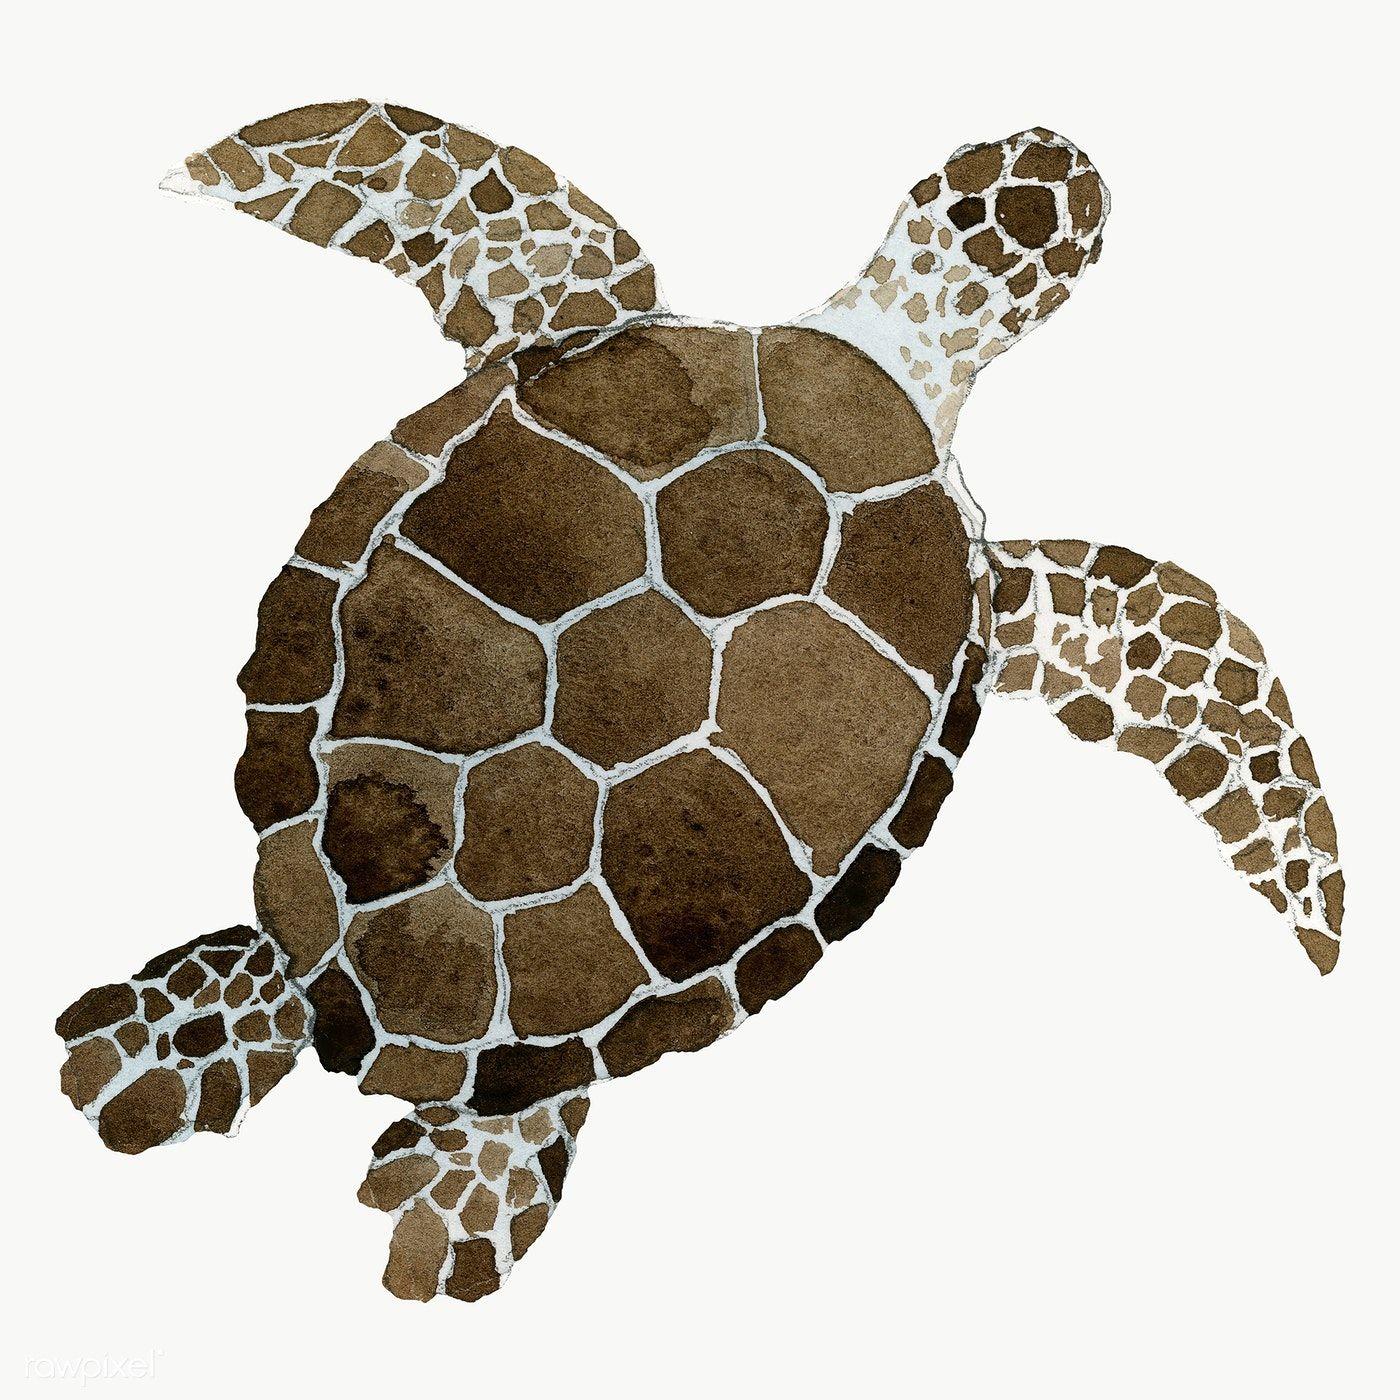 Watercolor Painted Sea Turtle Transparent Png Premium Image By Rawpixel Com Niwat Turtle Watercolor Sea Turtle Watercolor Sea Turtle Art